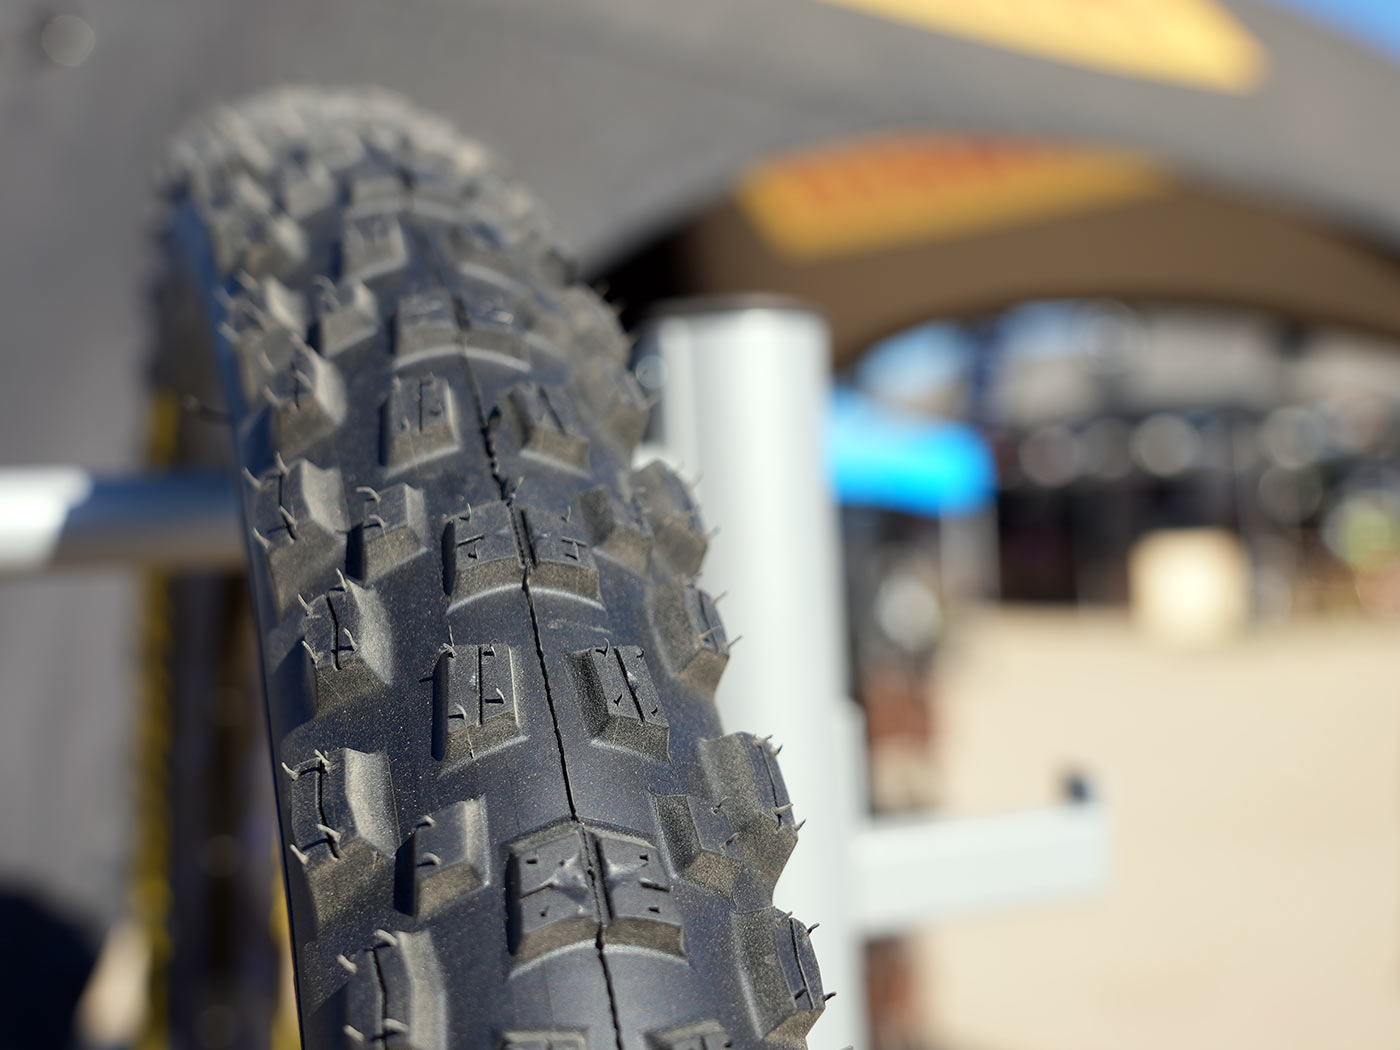 fabian barrel prototype pirelli downhill mountain bike tires